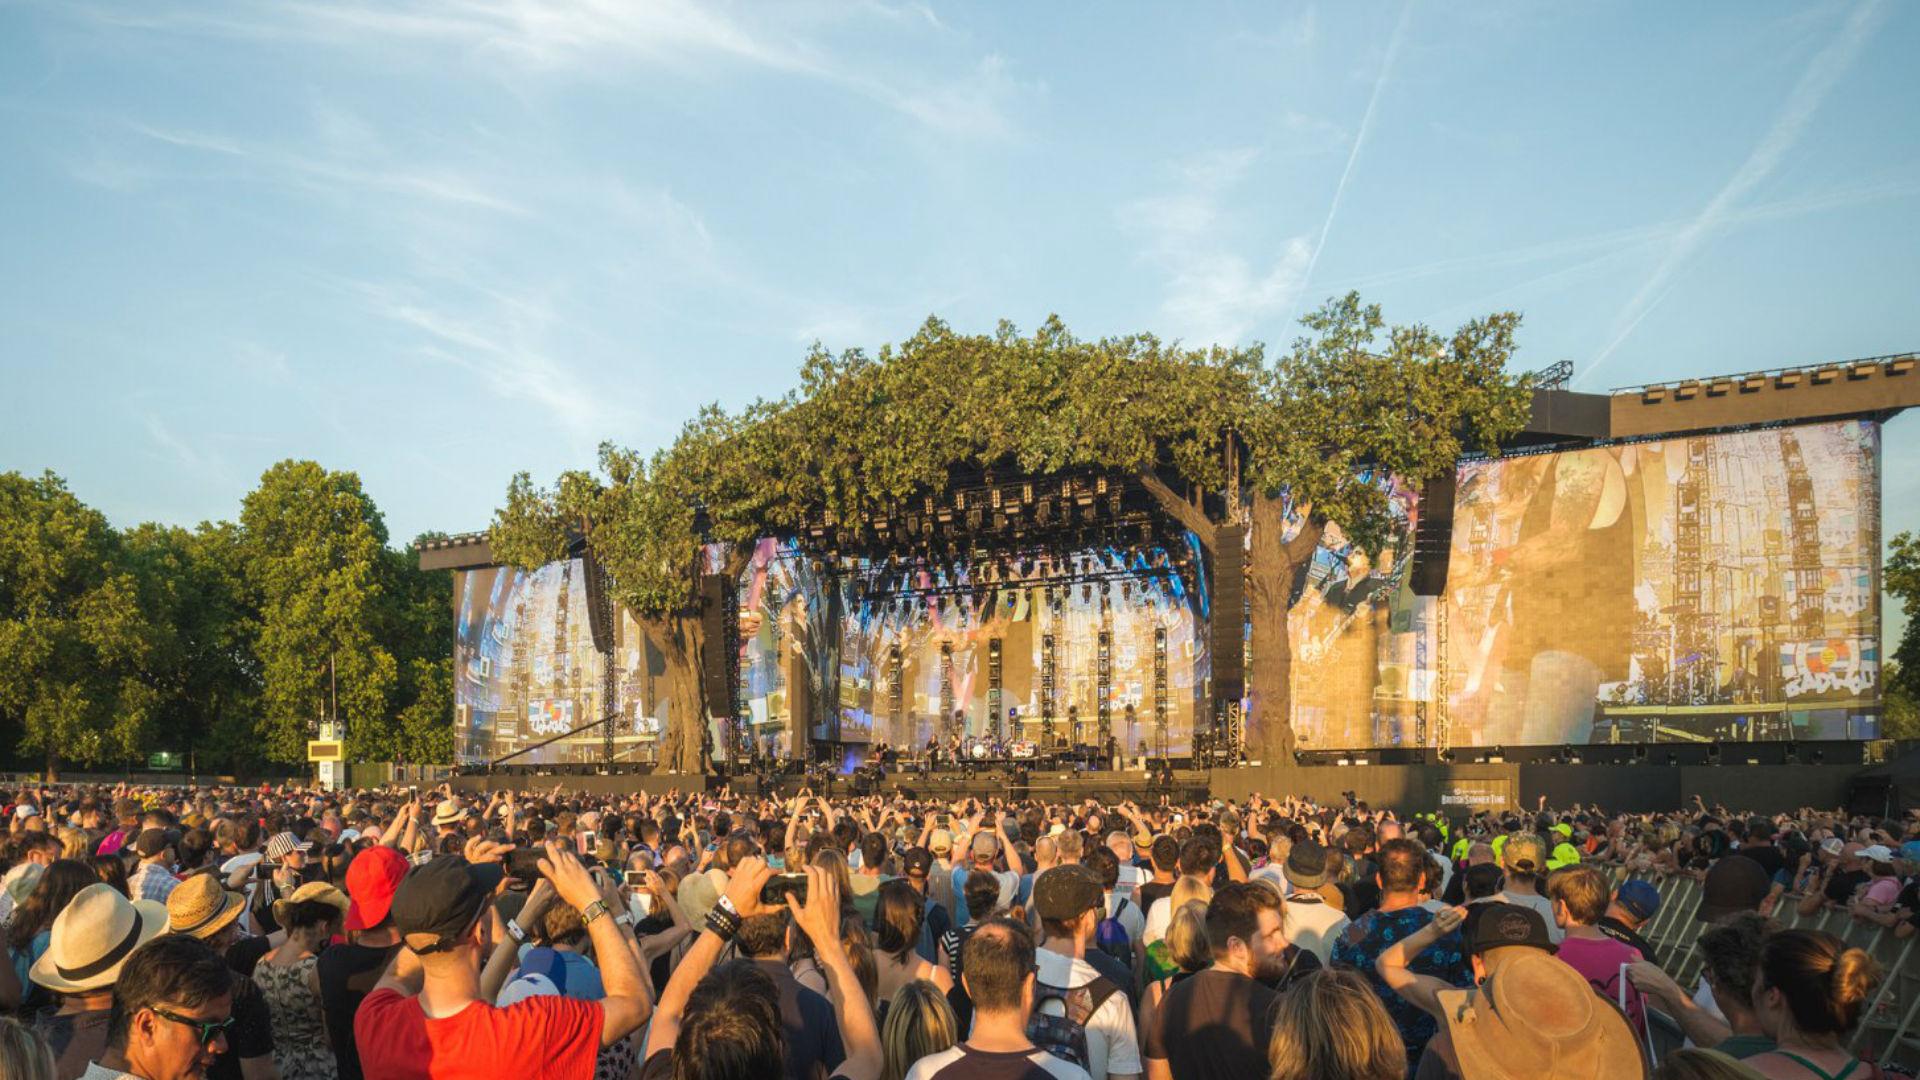 Barclaycard Presents British Summer Time Hyde Park Music Festival